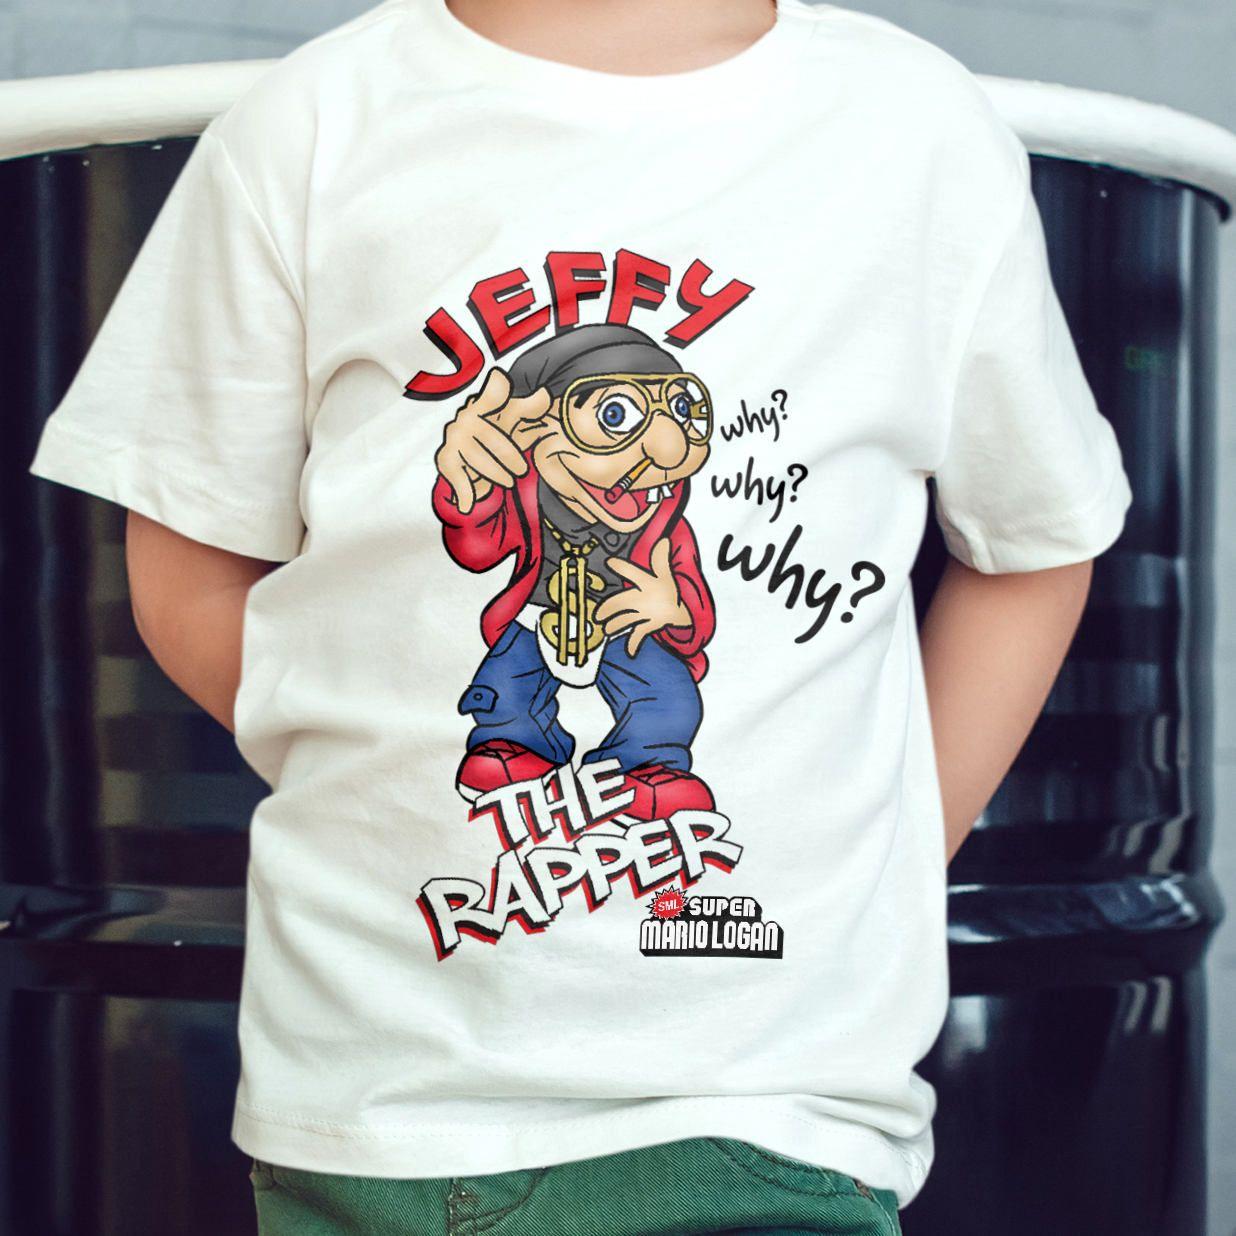 d447d343e4ad Jeffy The Rapper - SML T-Shirt - White, Ash Gray and Natural Jeffy T-shirts  - SML Rapper